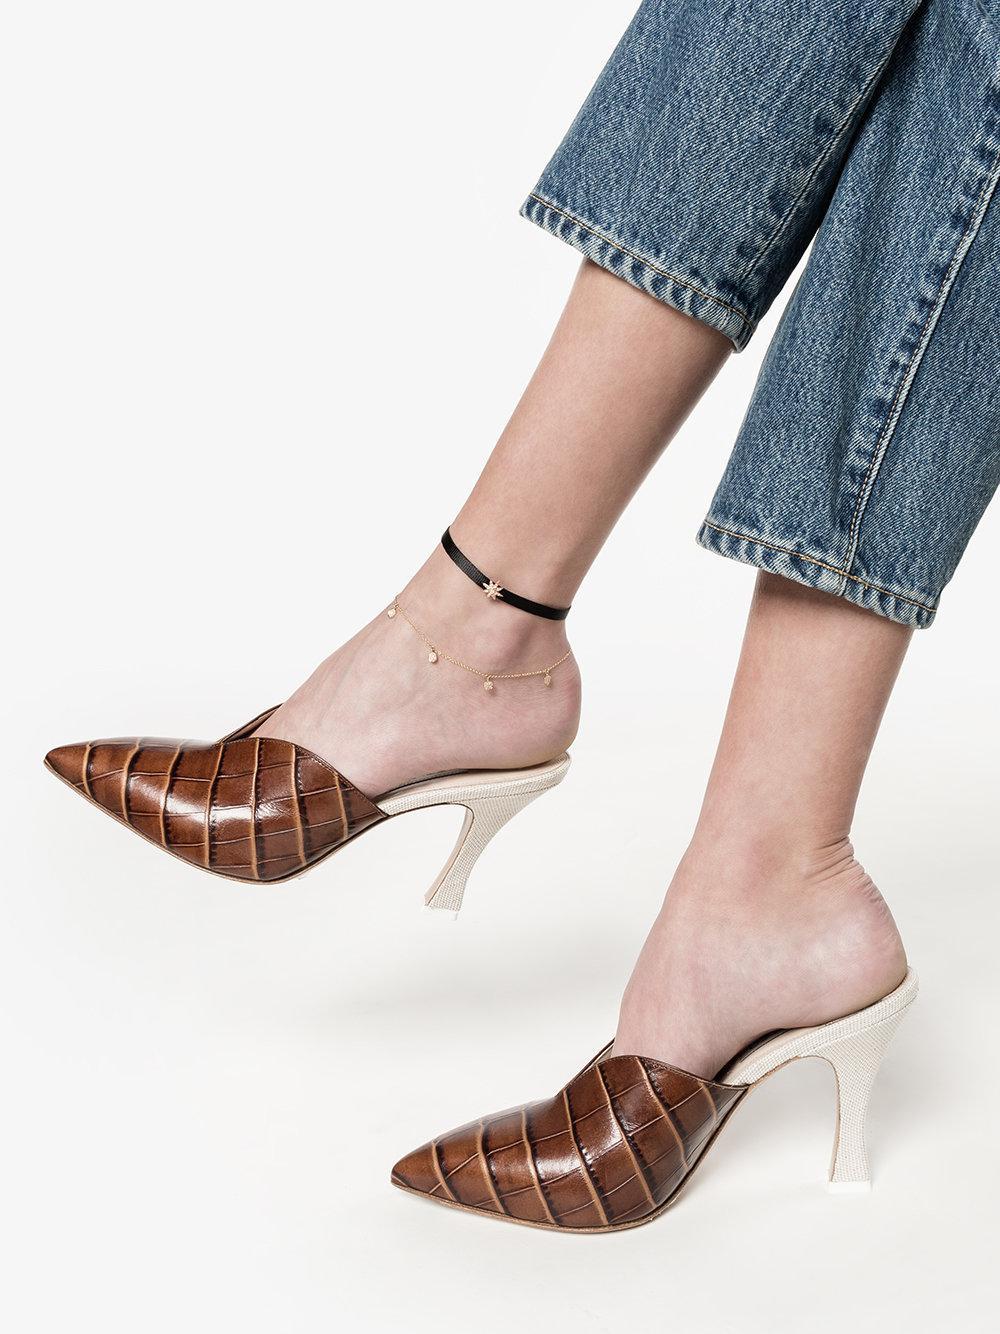 SHAY Dangle Drop Anklet in Grey (Grey)